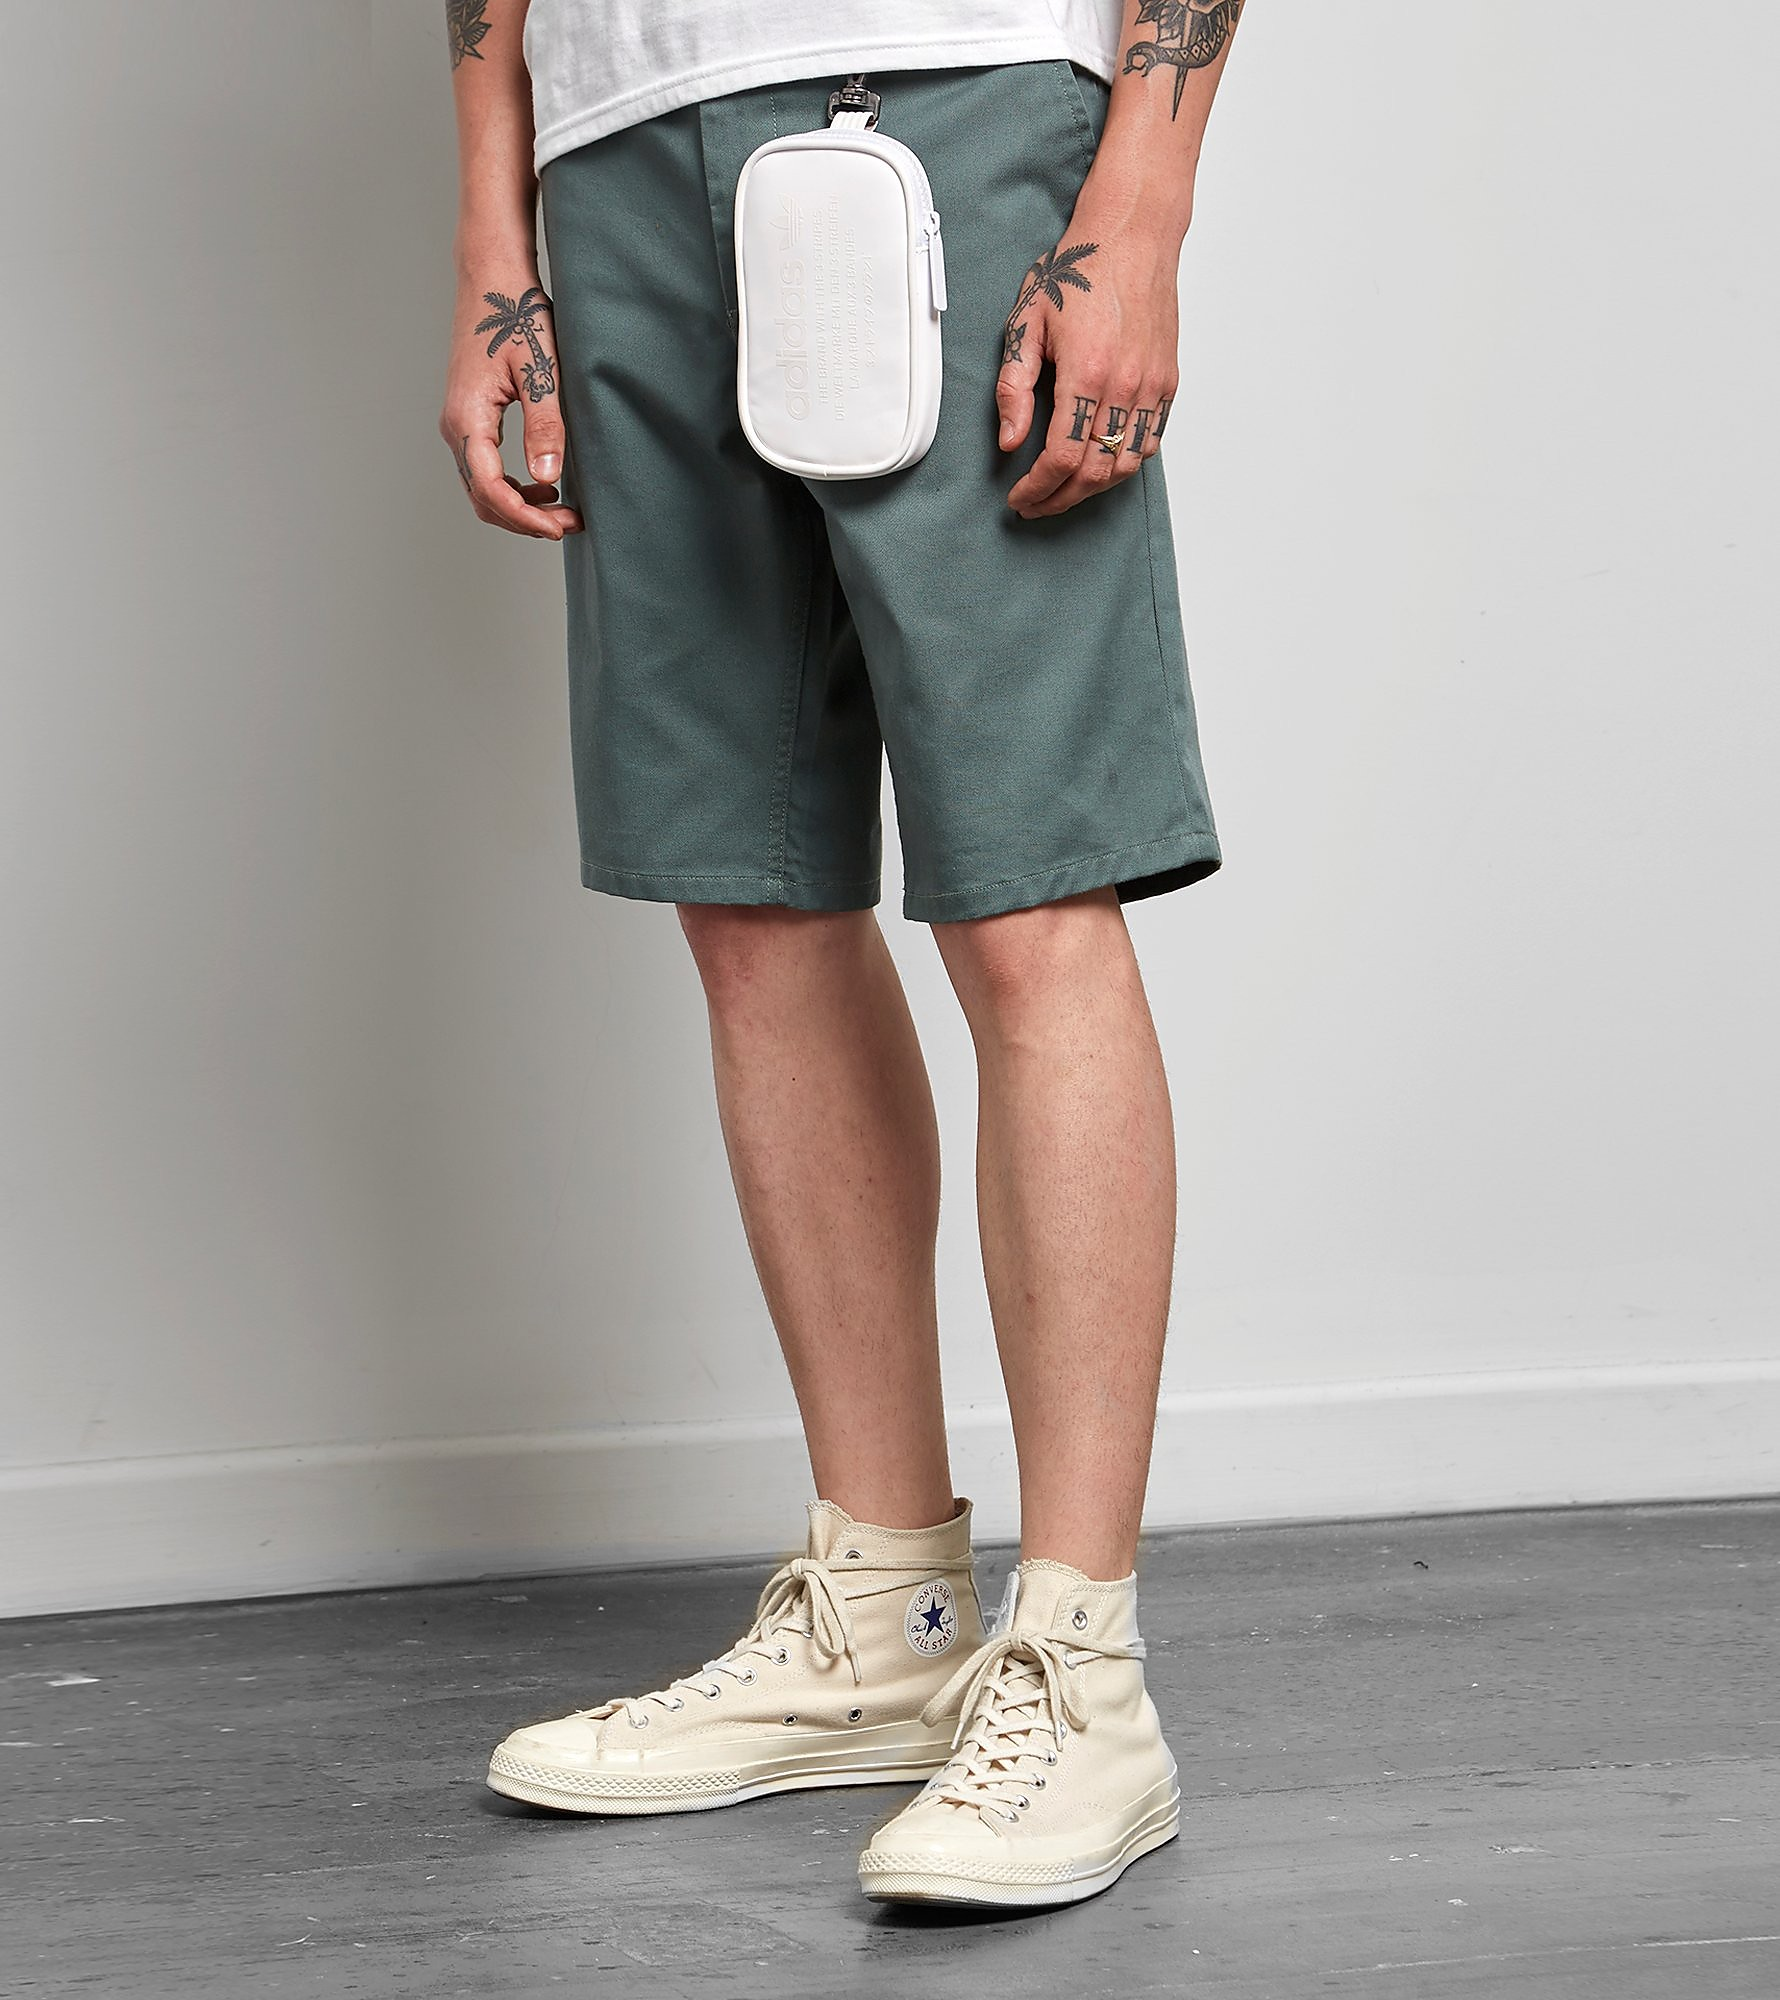 adidas Originals NMD Pouch